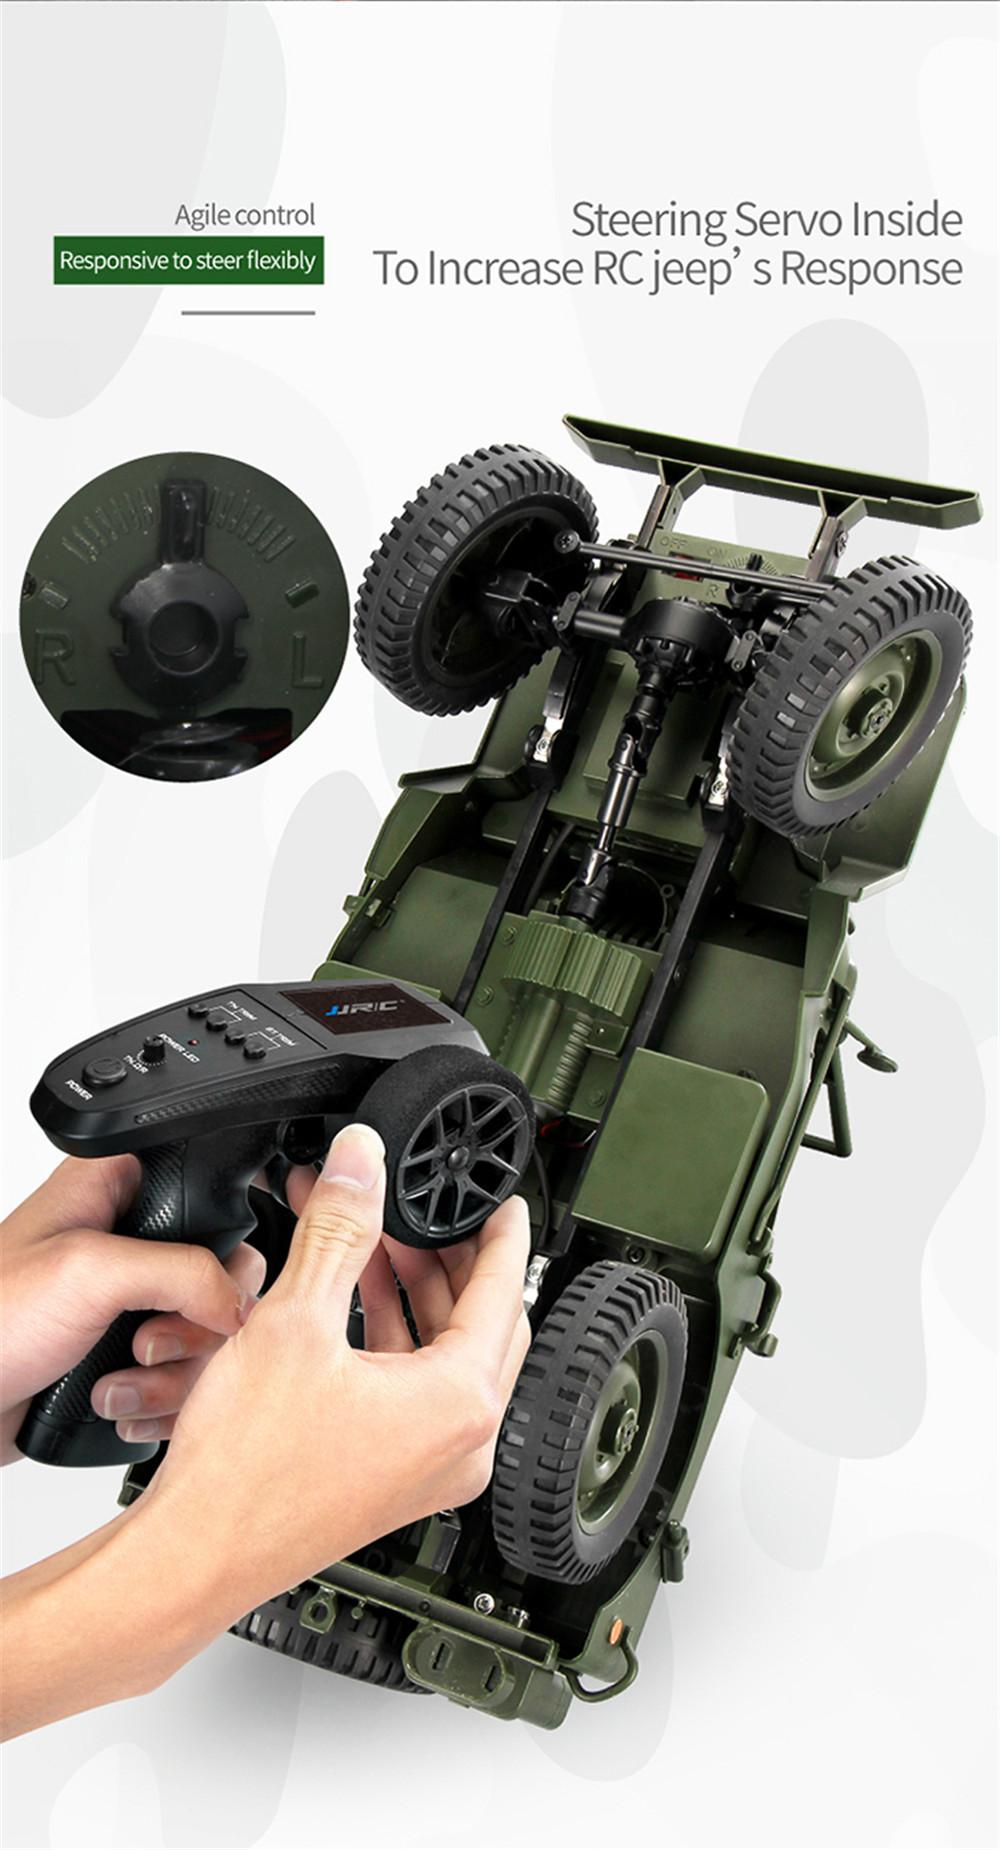 Rc Car News >> Ces News Jjrc Q65 2 4g 1 10 Jedi Proportional Control Crawler 4wd Off Road Rc Car